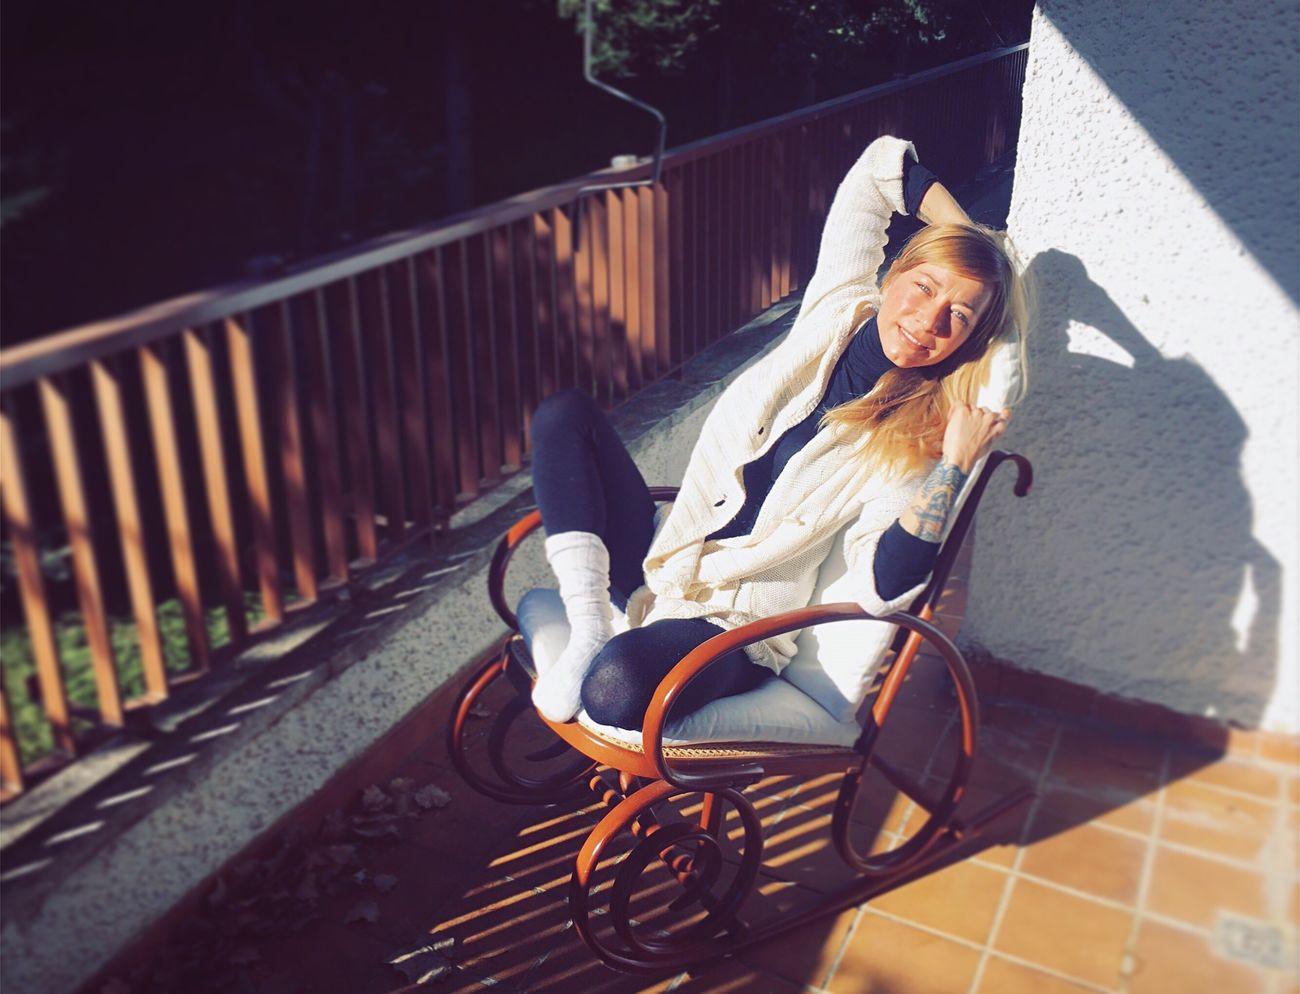 https://m.youtube.com/watch?v=1in5wAVOyIk Wine Moments Having Fun Good Morning Travel Relaxing EyeEmNewHere Landscape Light Portrait Of A Woman Women Of EyeEm Tattoo Happy Bestoftheday Chair Hammock Saturday SPAIN JustMe Smile